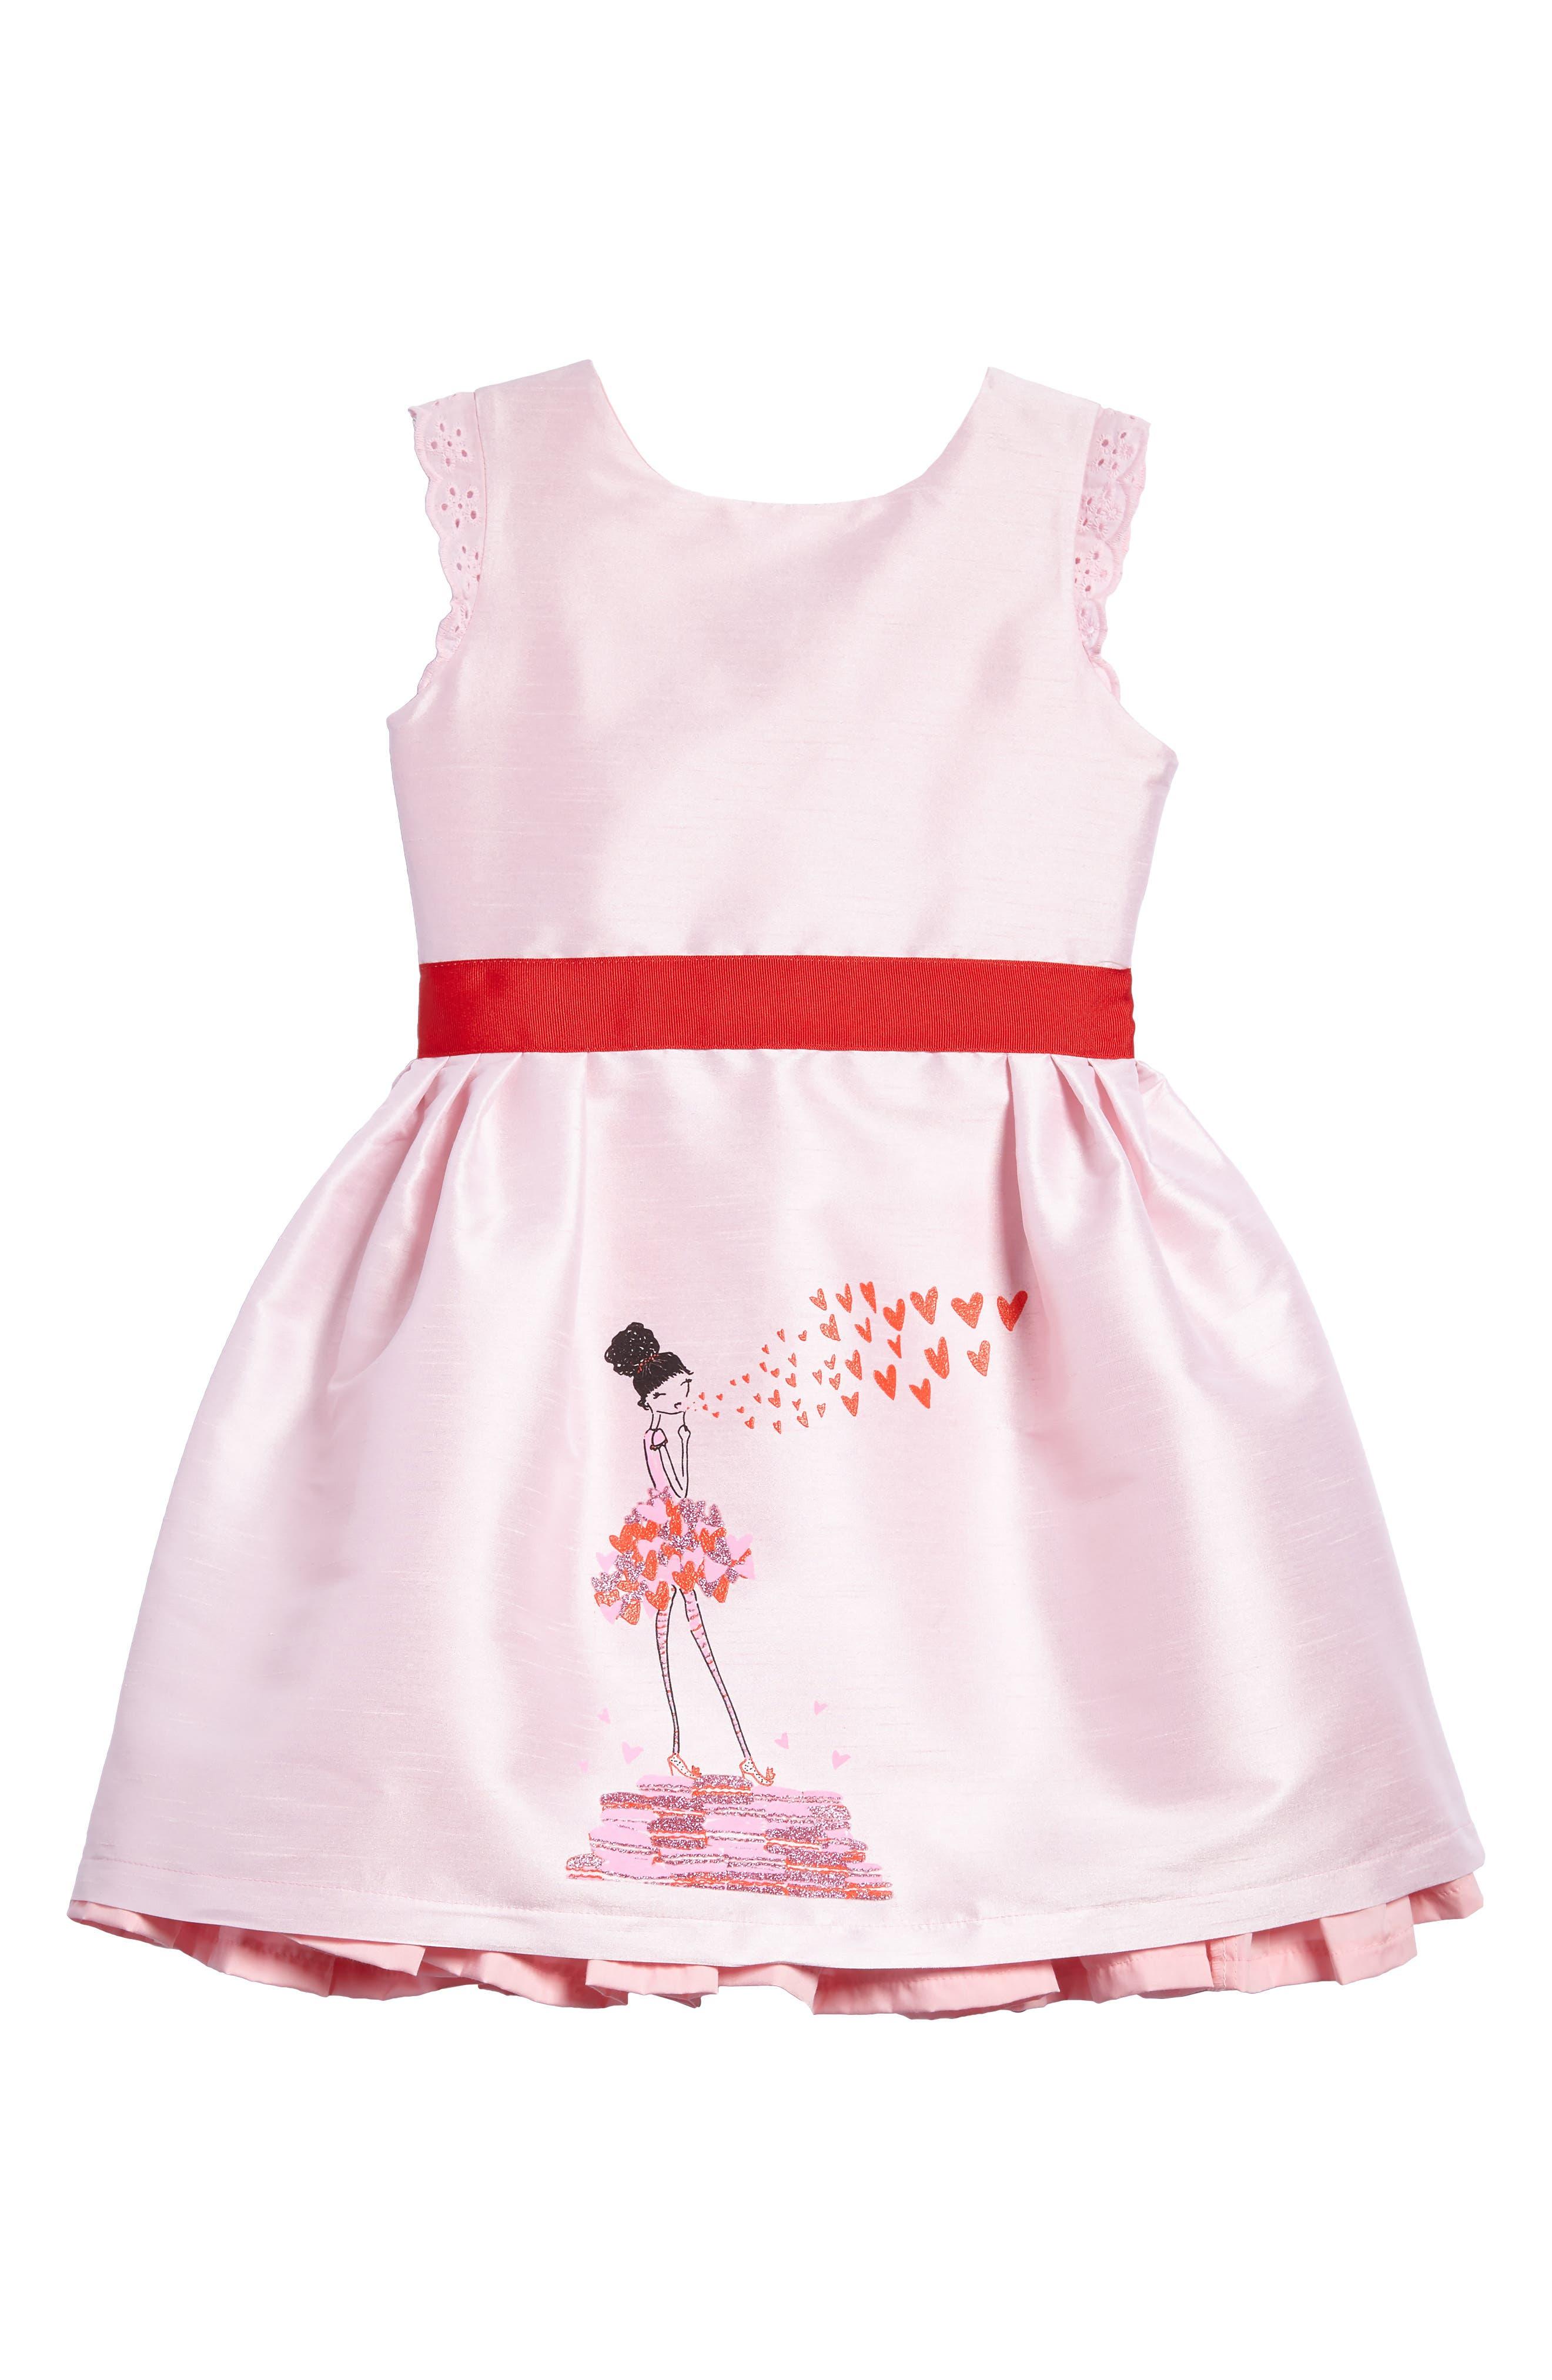 Kisses from Paris Party Dress,                             Main thumbnail 1, color,                             Pink